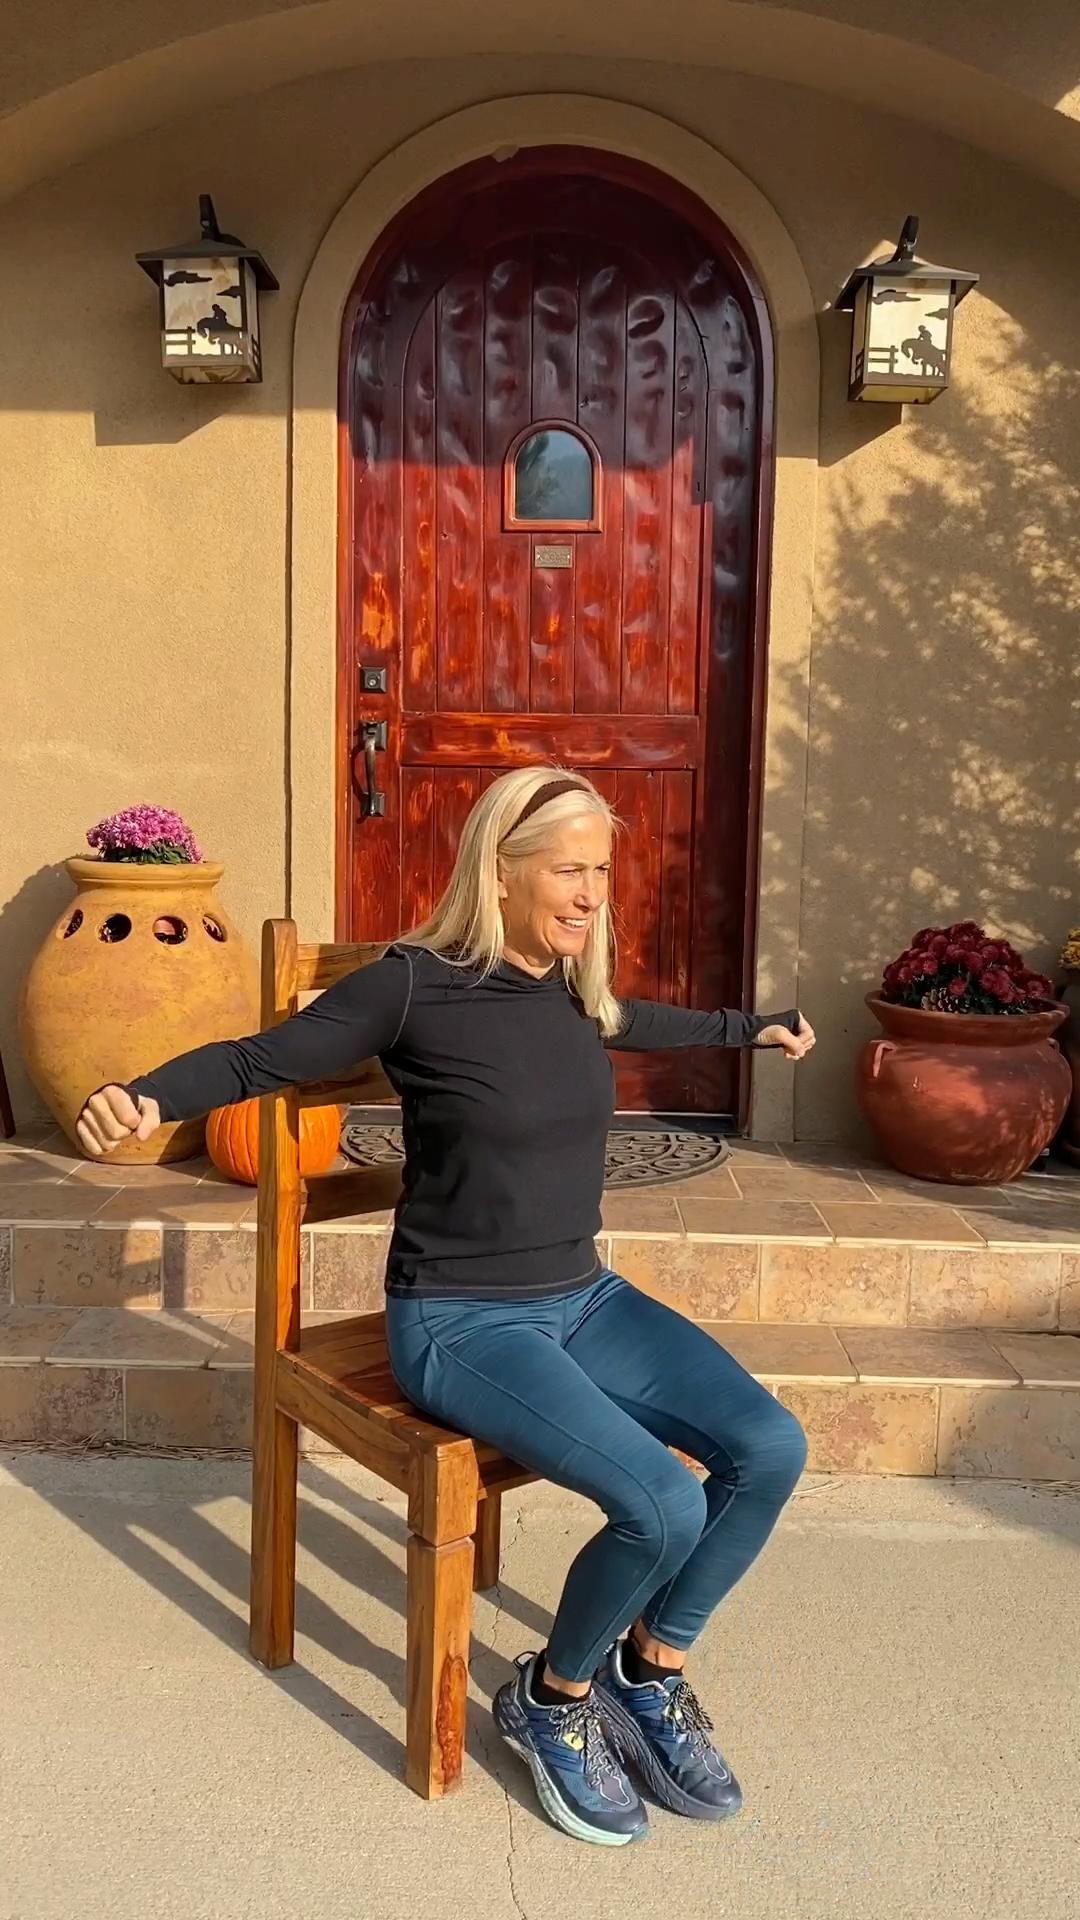 Beginner Chair Cardio Workout